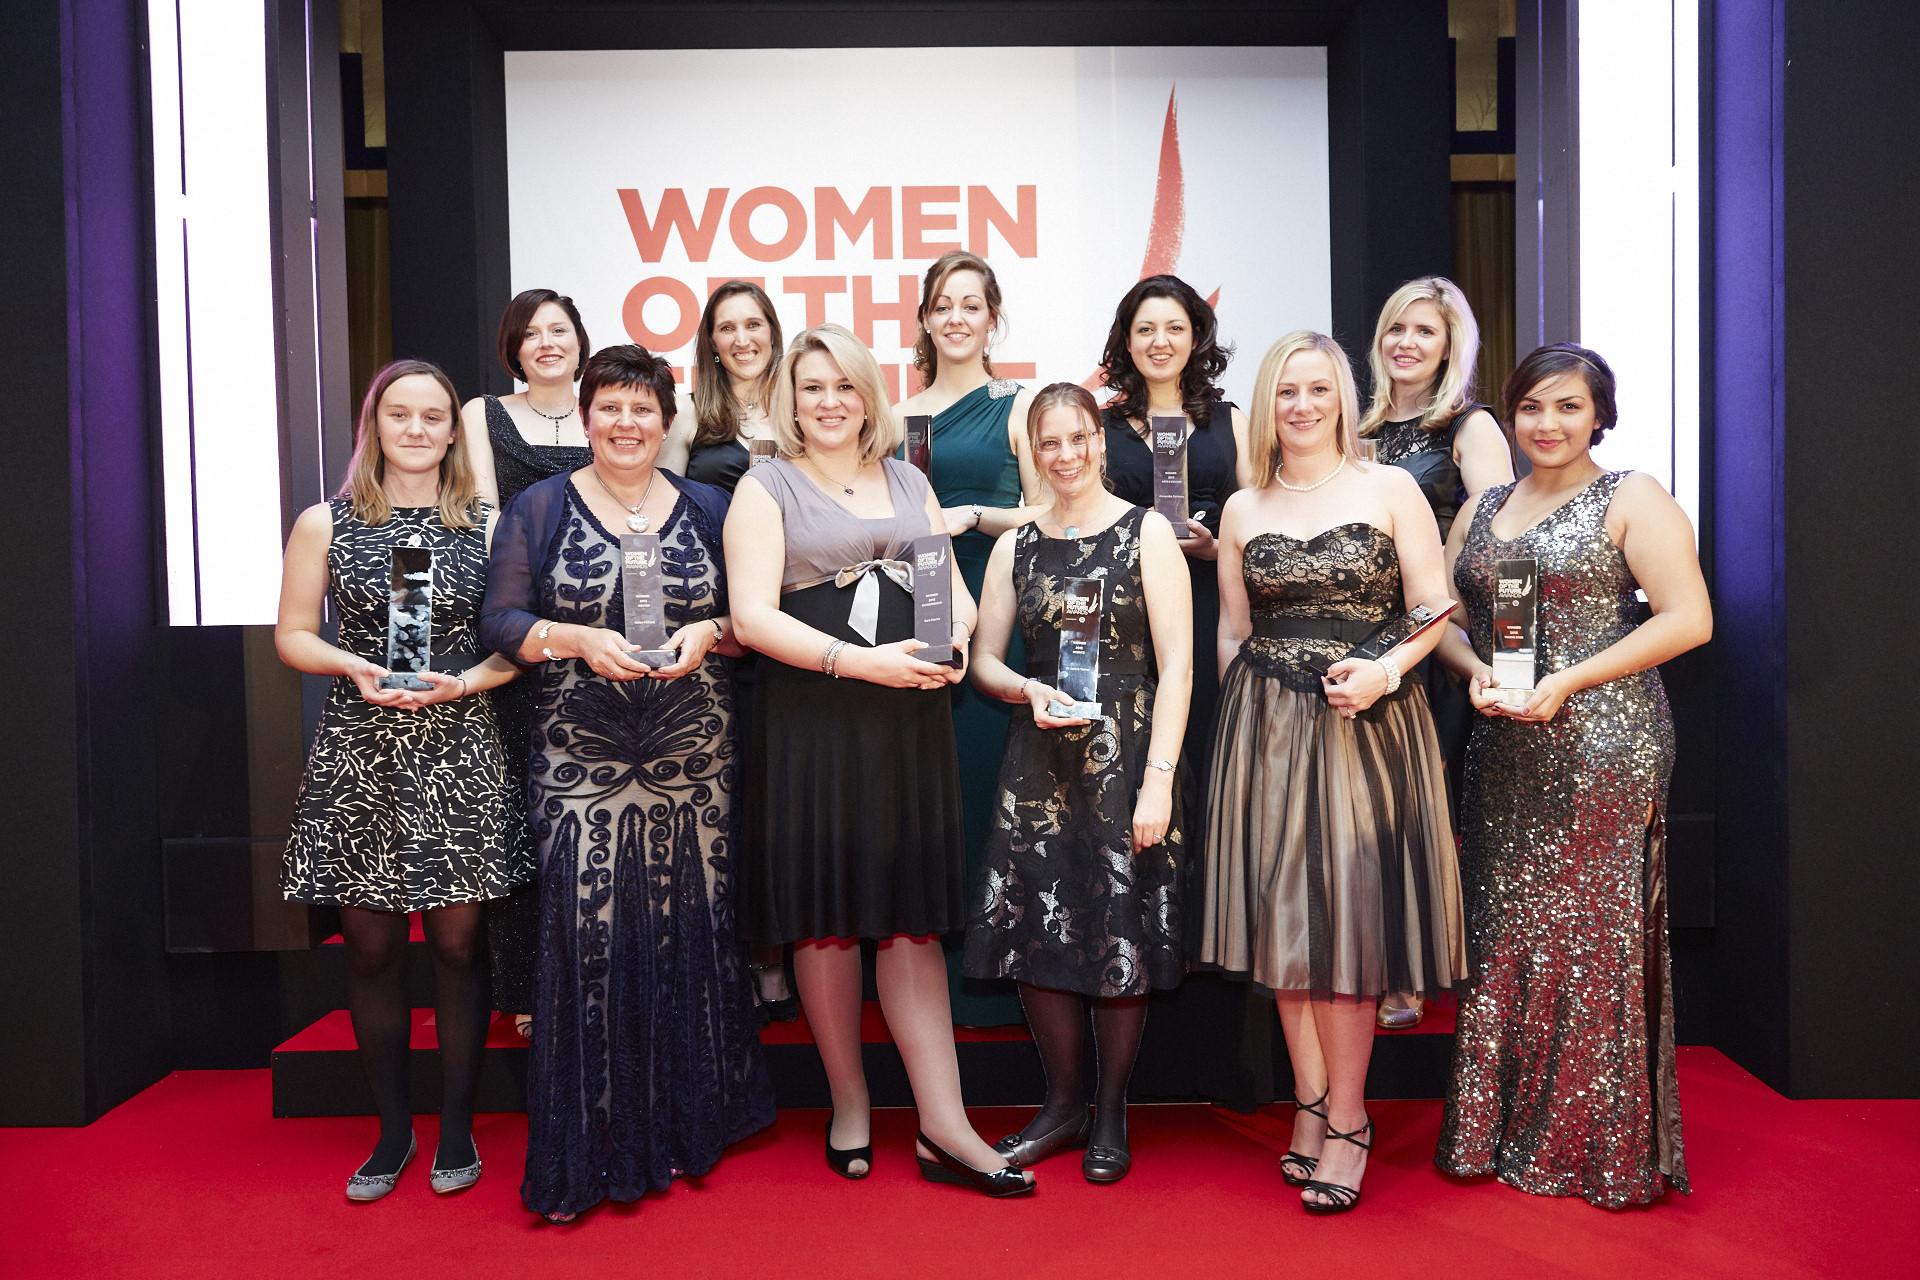 Women of the Future 2013: Meet the winners